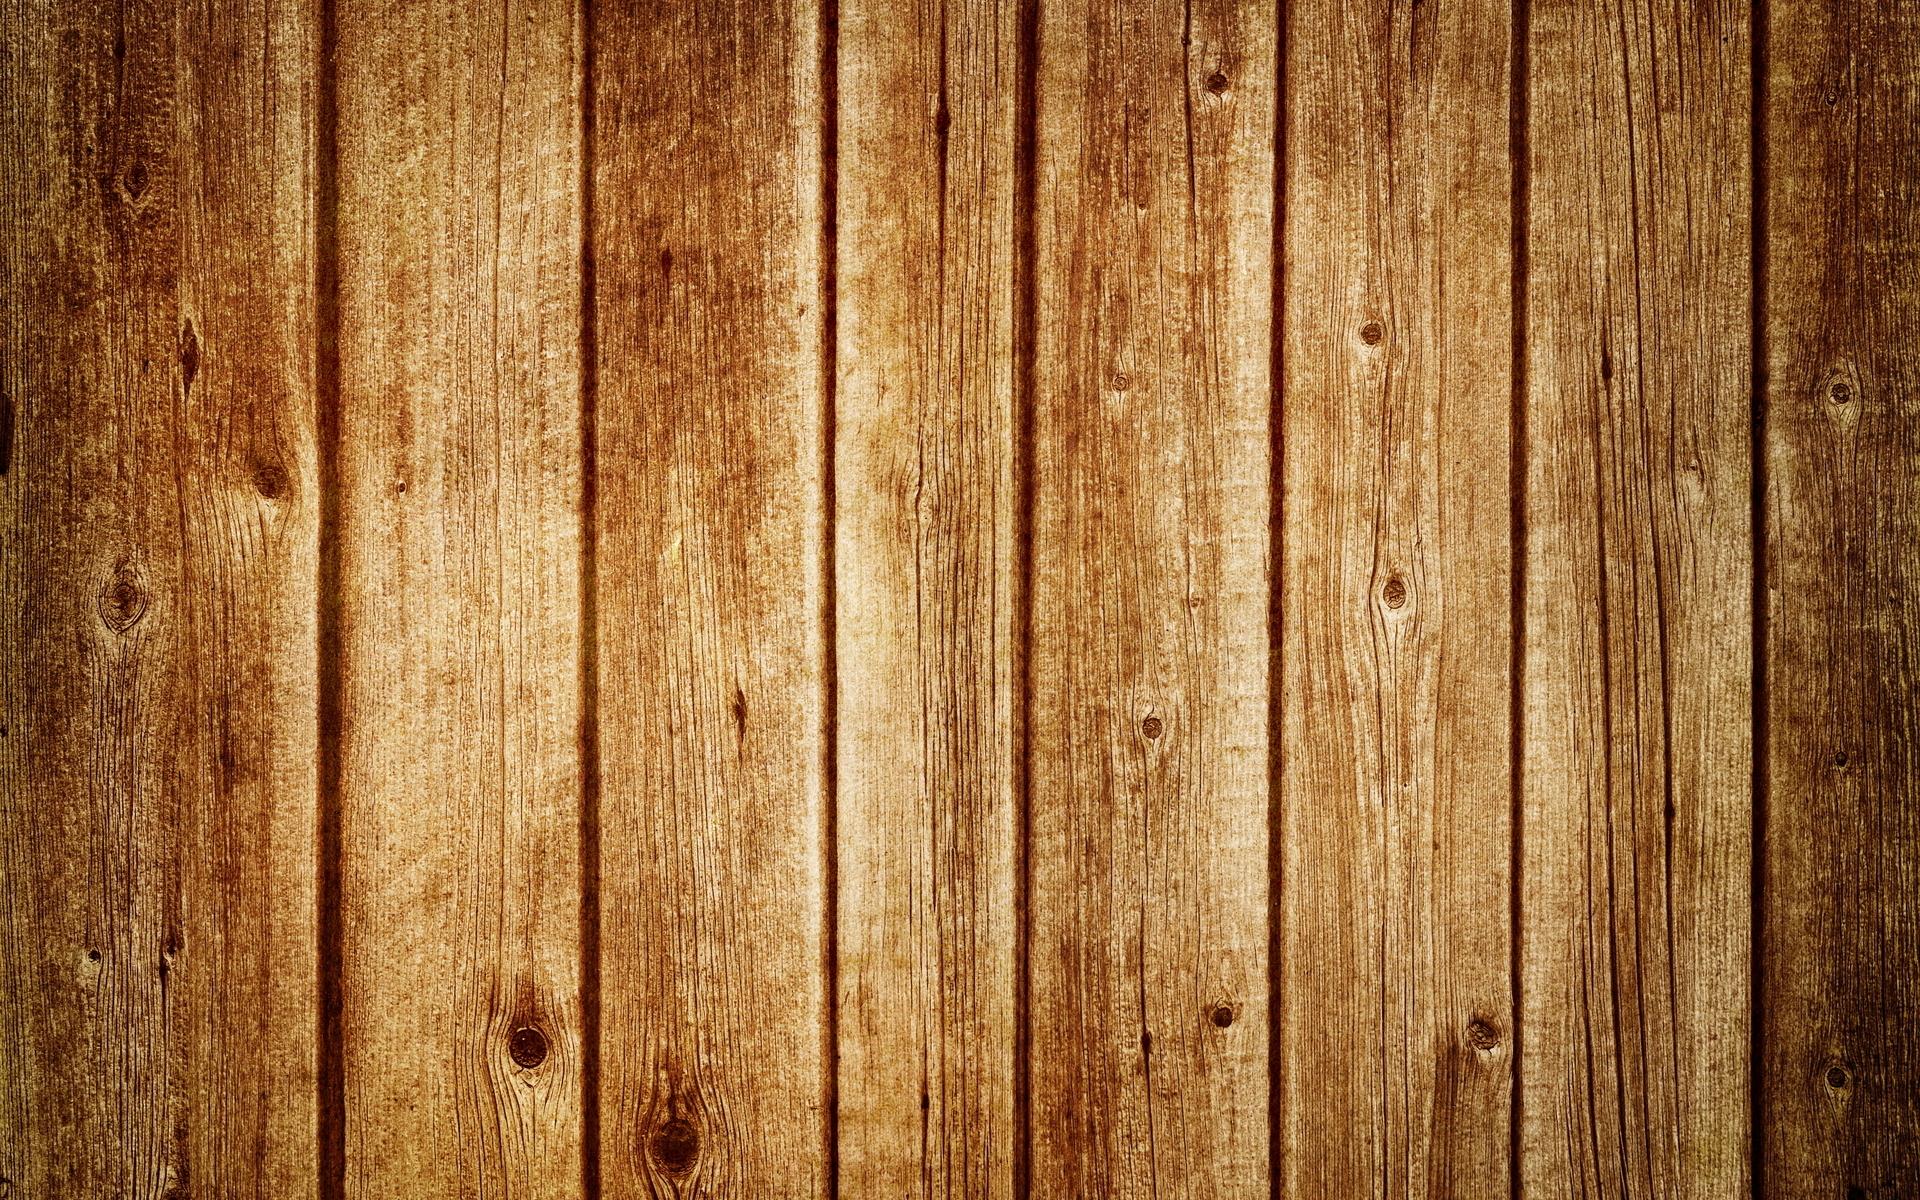 Board Wood Tree Macro HD Wallpaper 3D Abstract Wallpapers 1920x1200